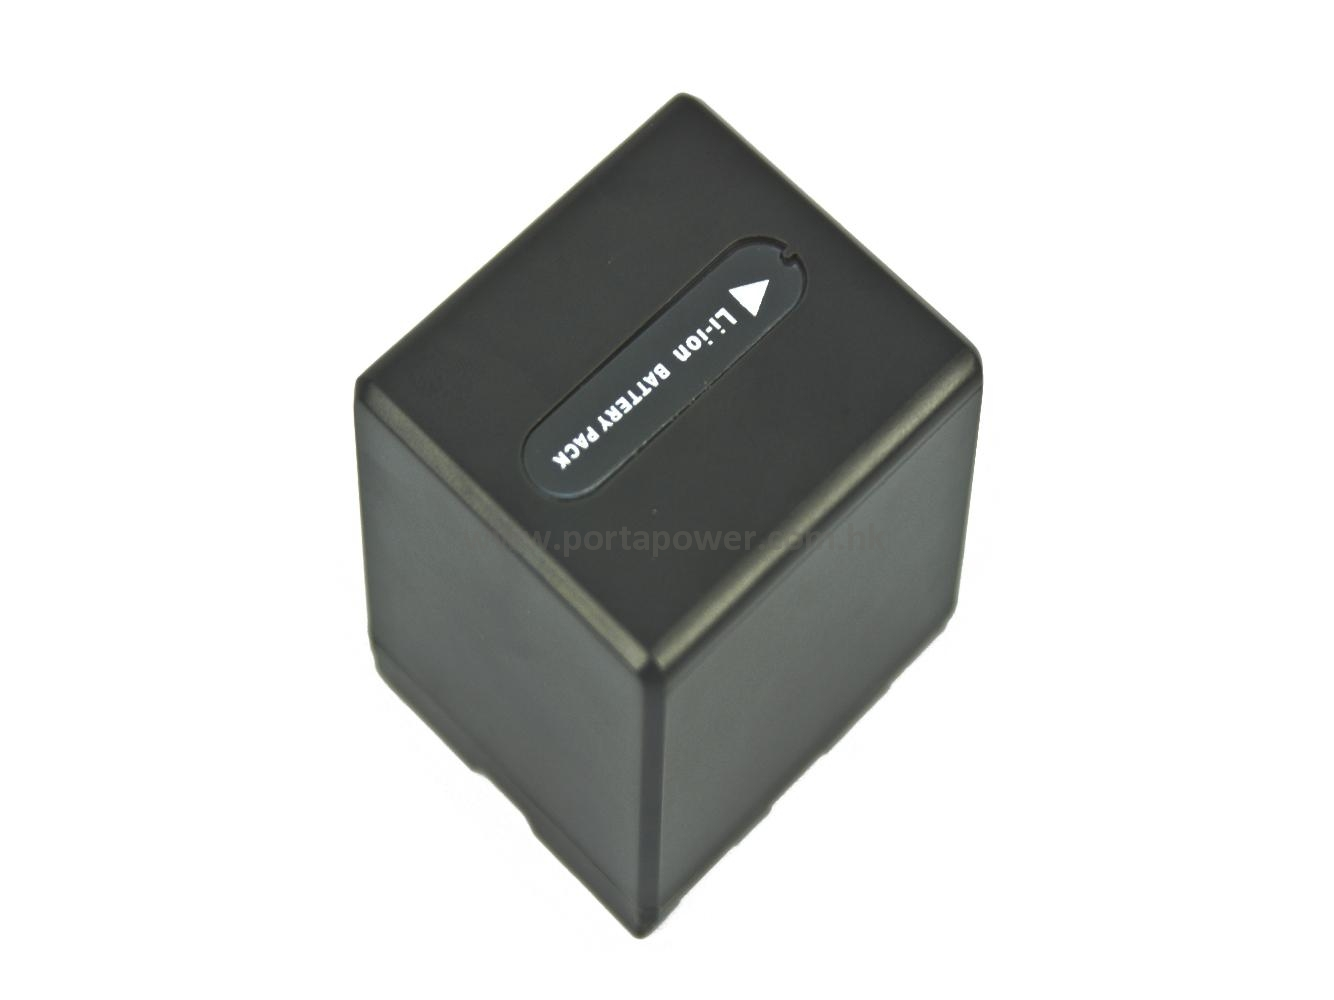 Camcorder batteria Accu per Panasonic nv-gs180